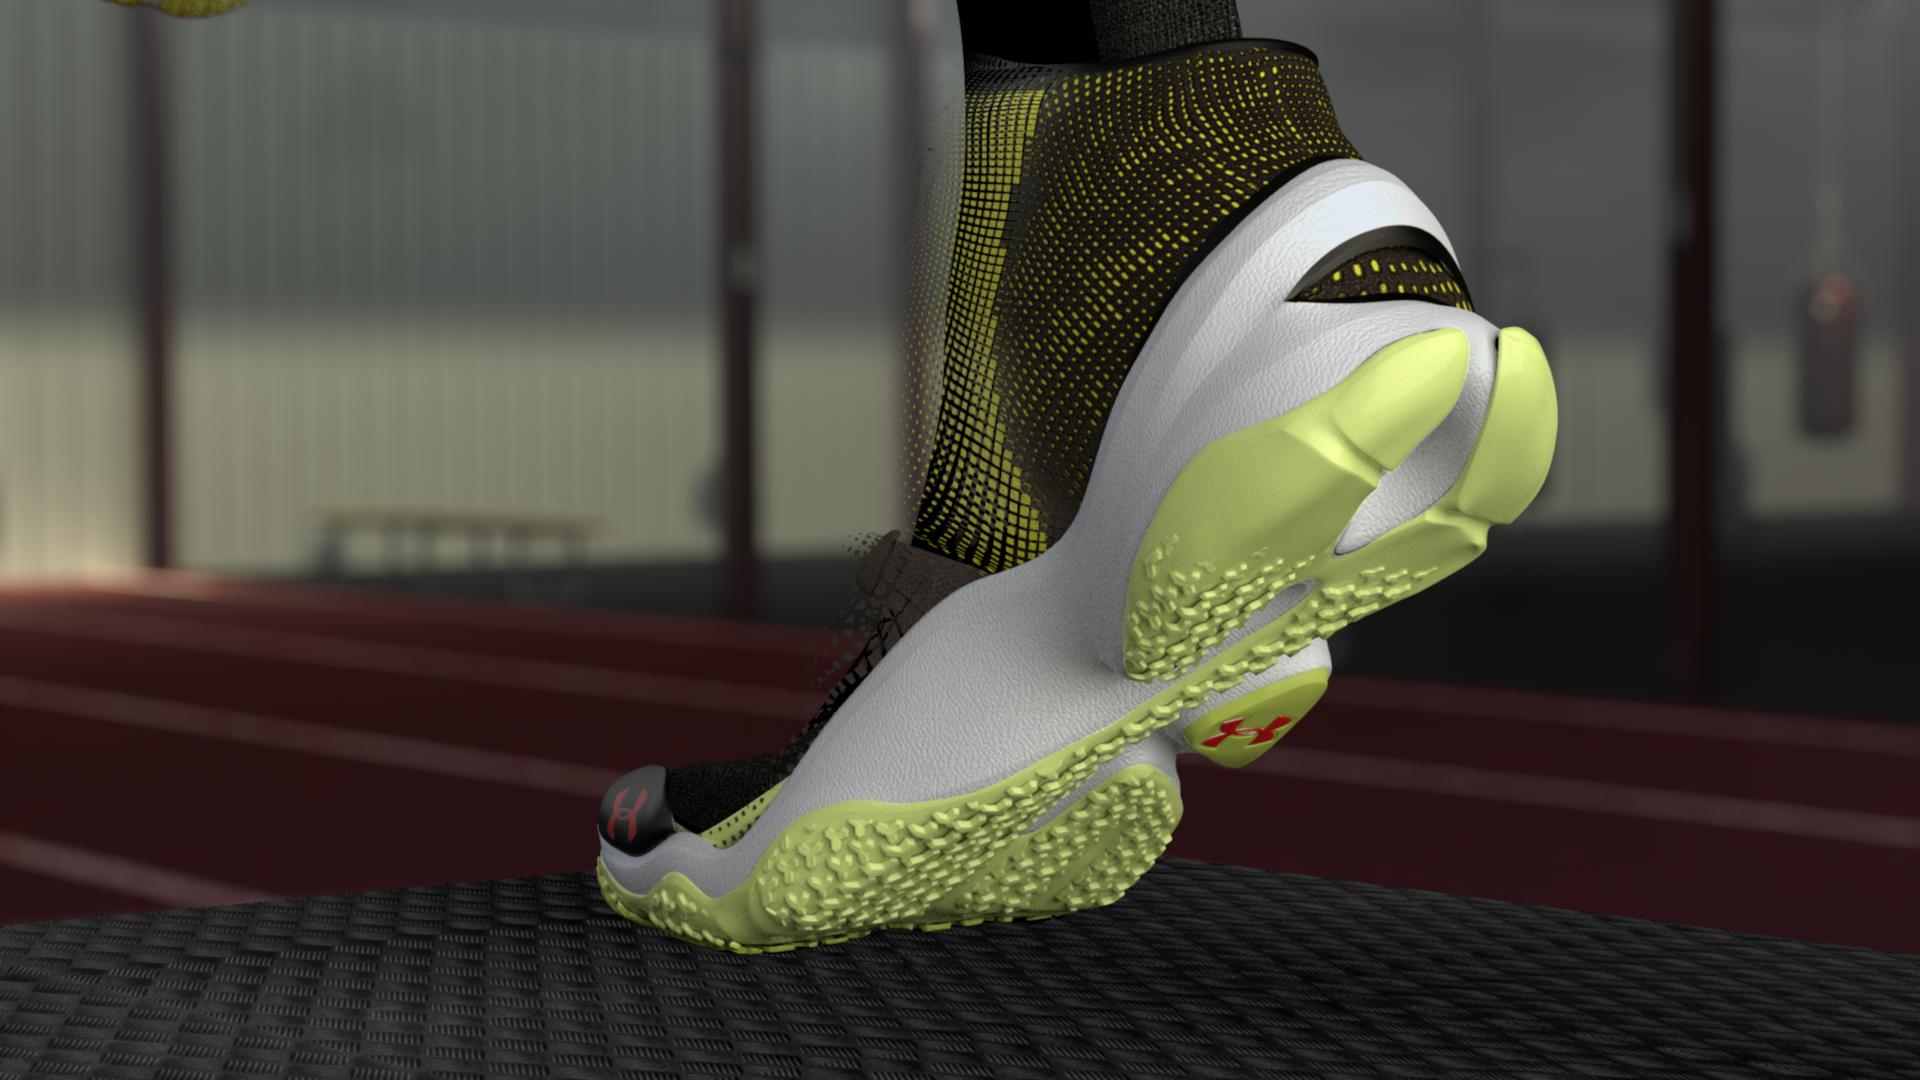 05.Shoe_Adjustments.png